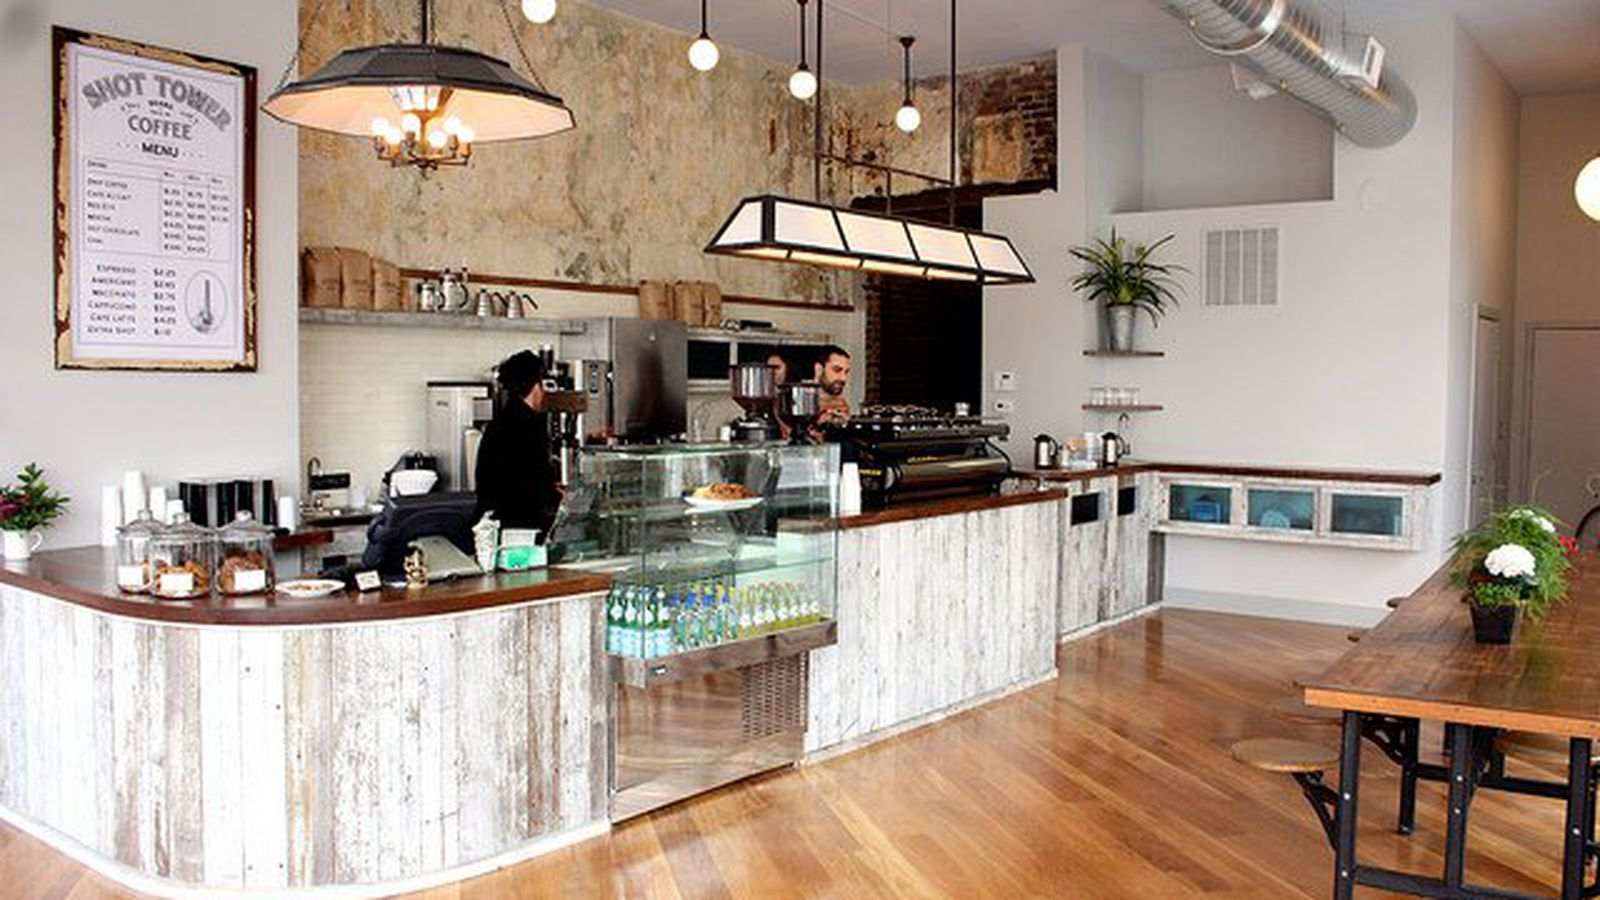 Get caffeinated best coffee shop coffee shop coffee guide